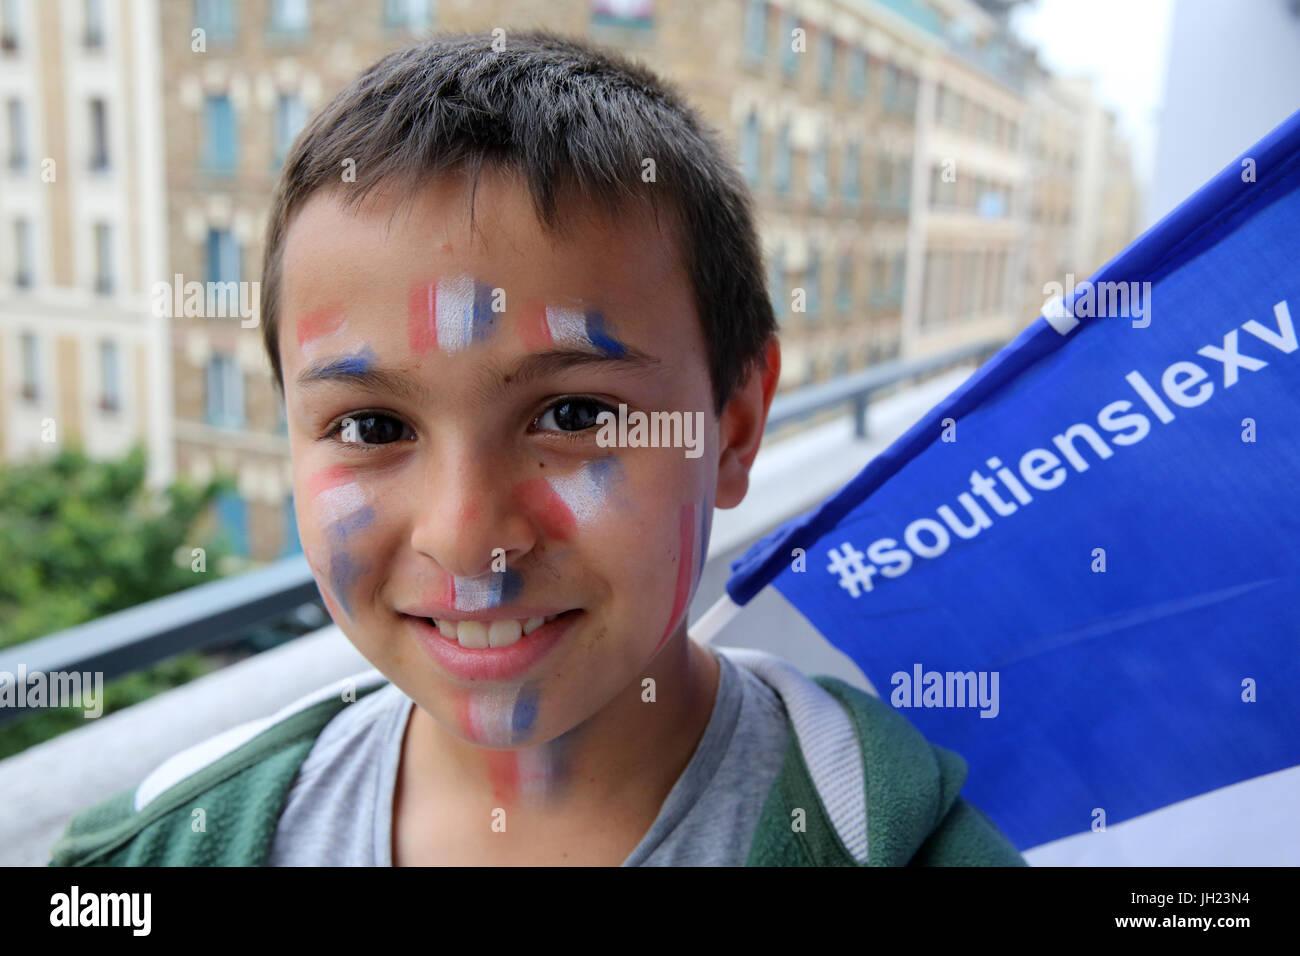 Supporter de football français. La France. Photo Stock